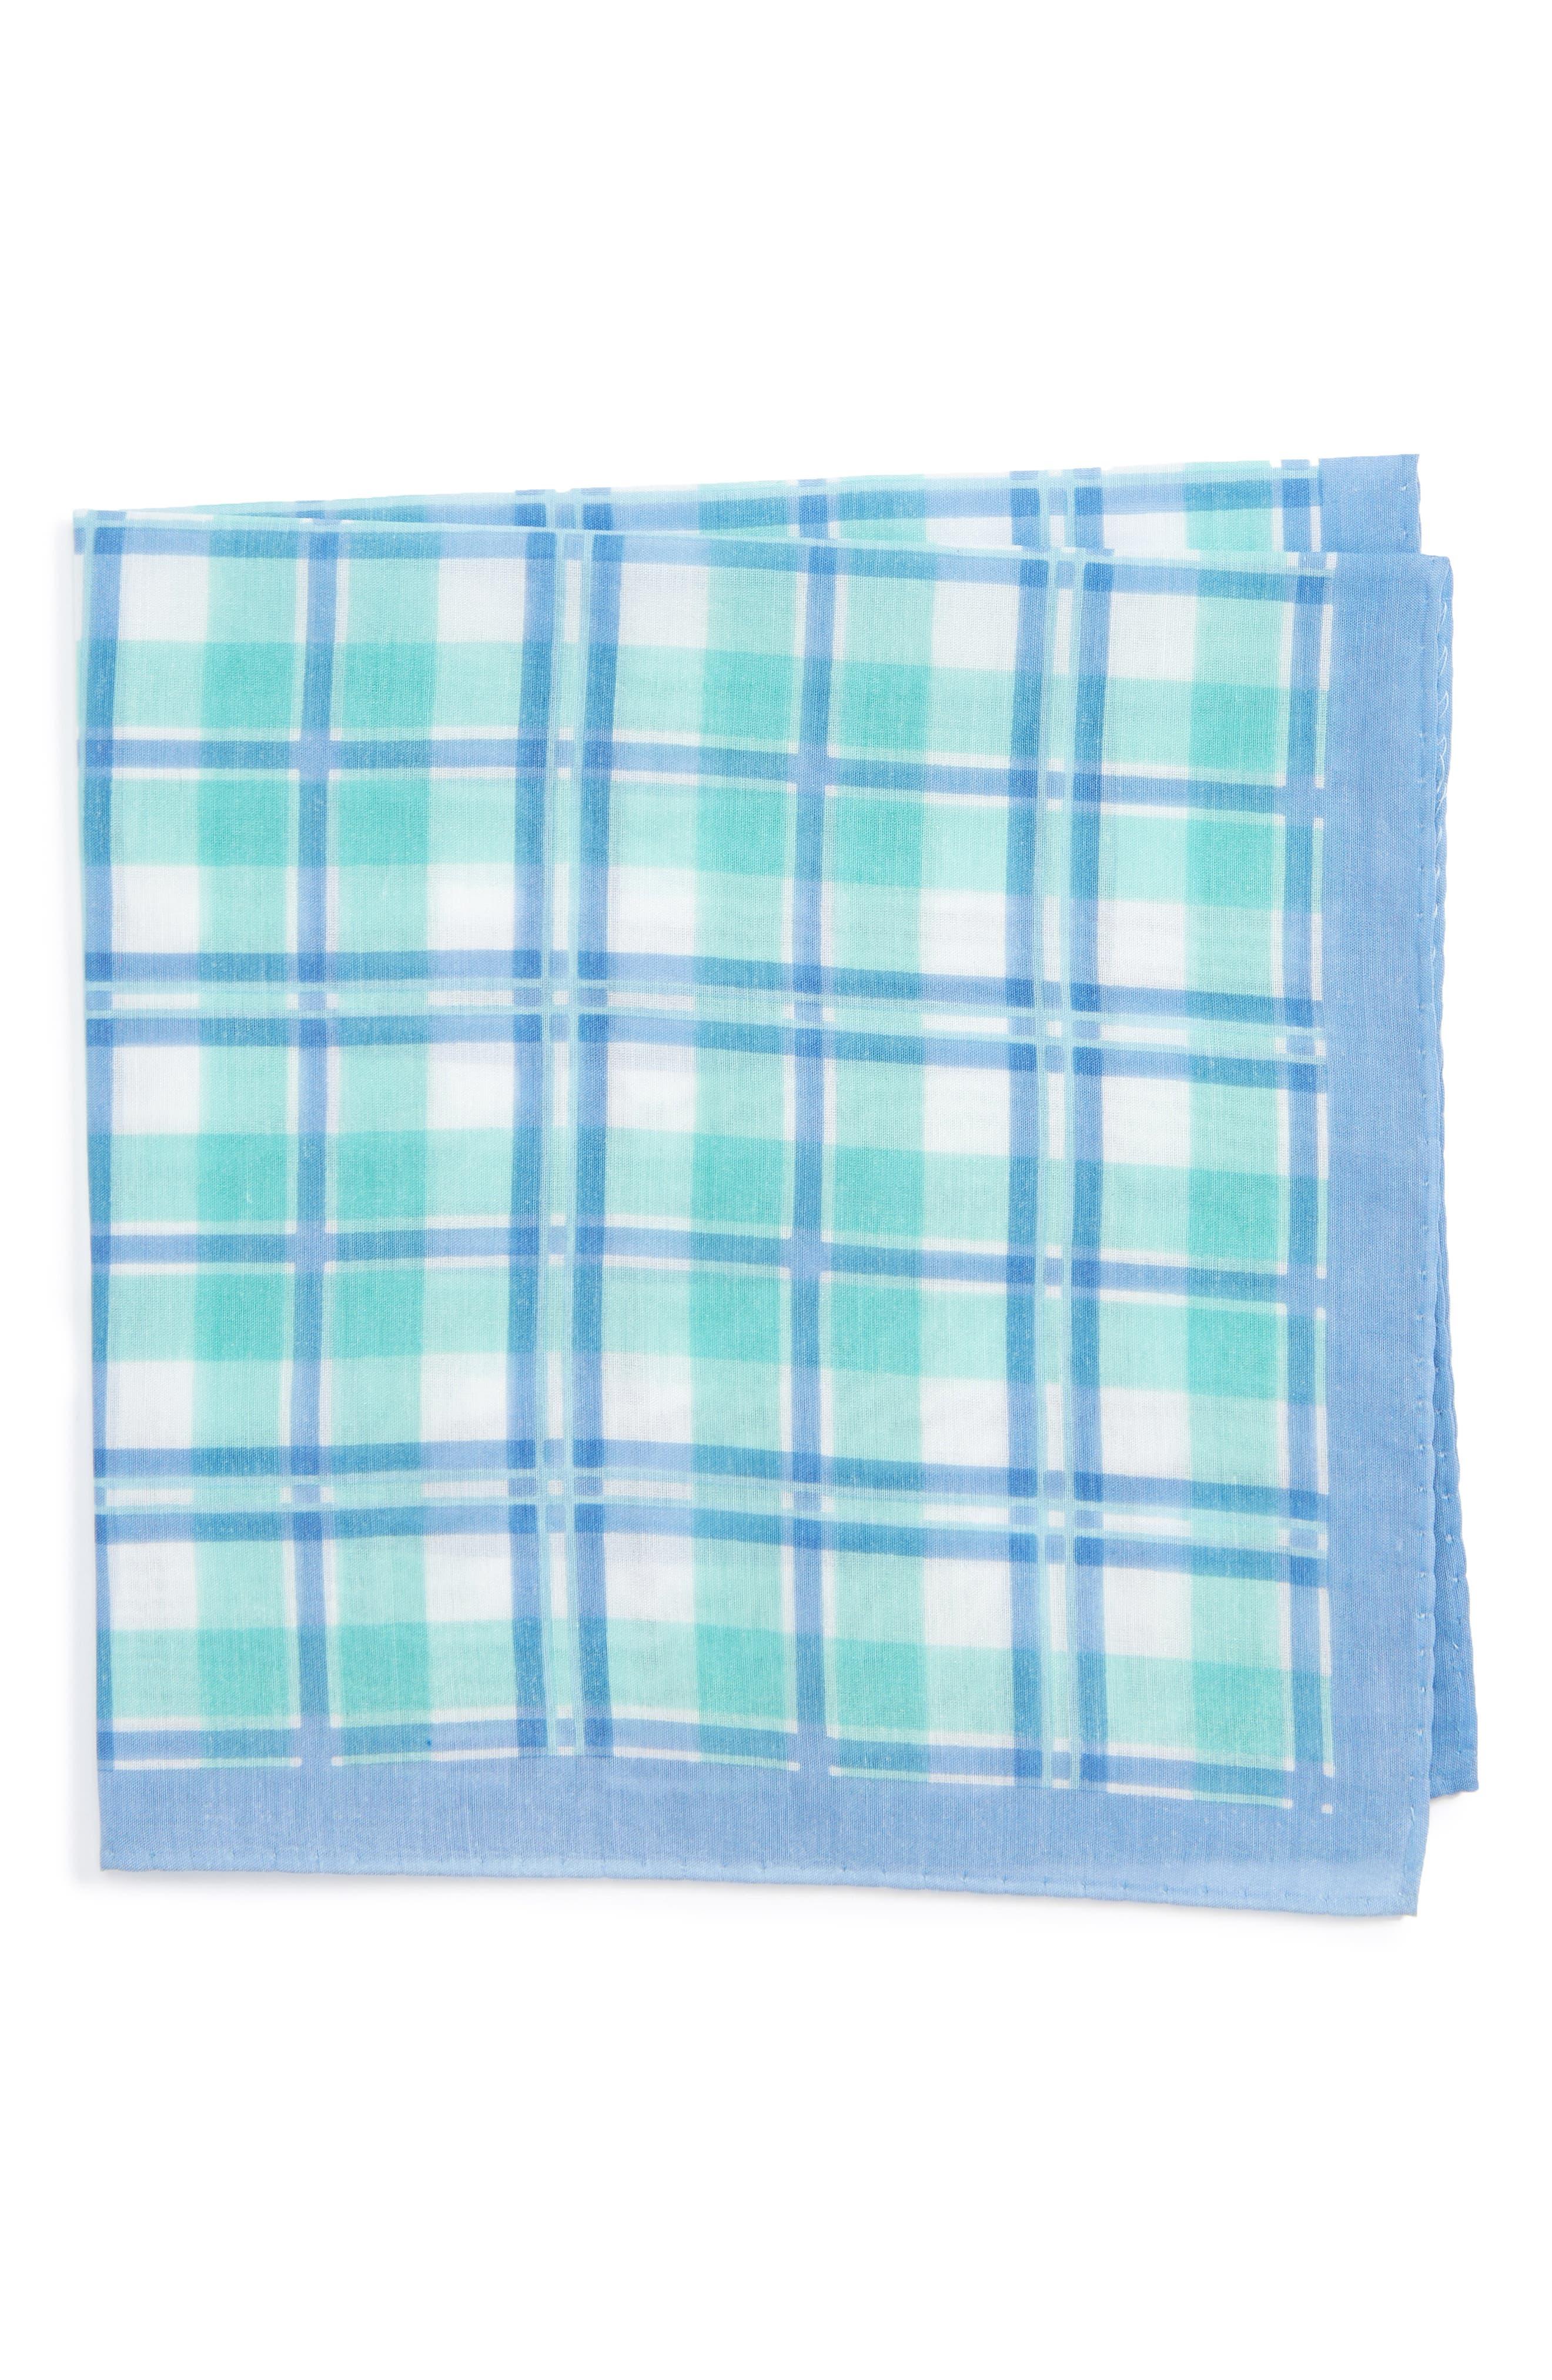 NORDSTROM MENS SHOP Leoni Plaid Silk & Cotton Pocket Square